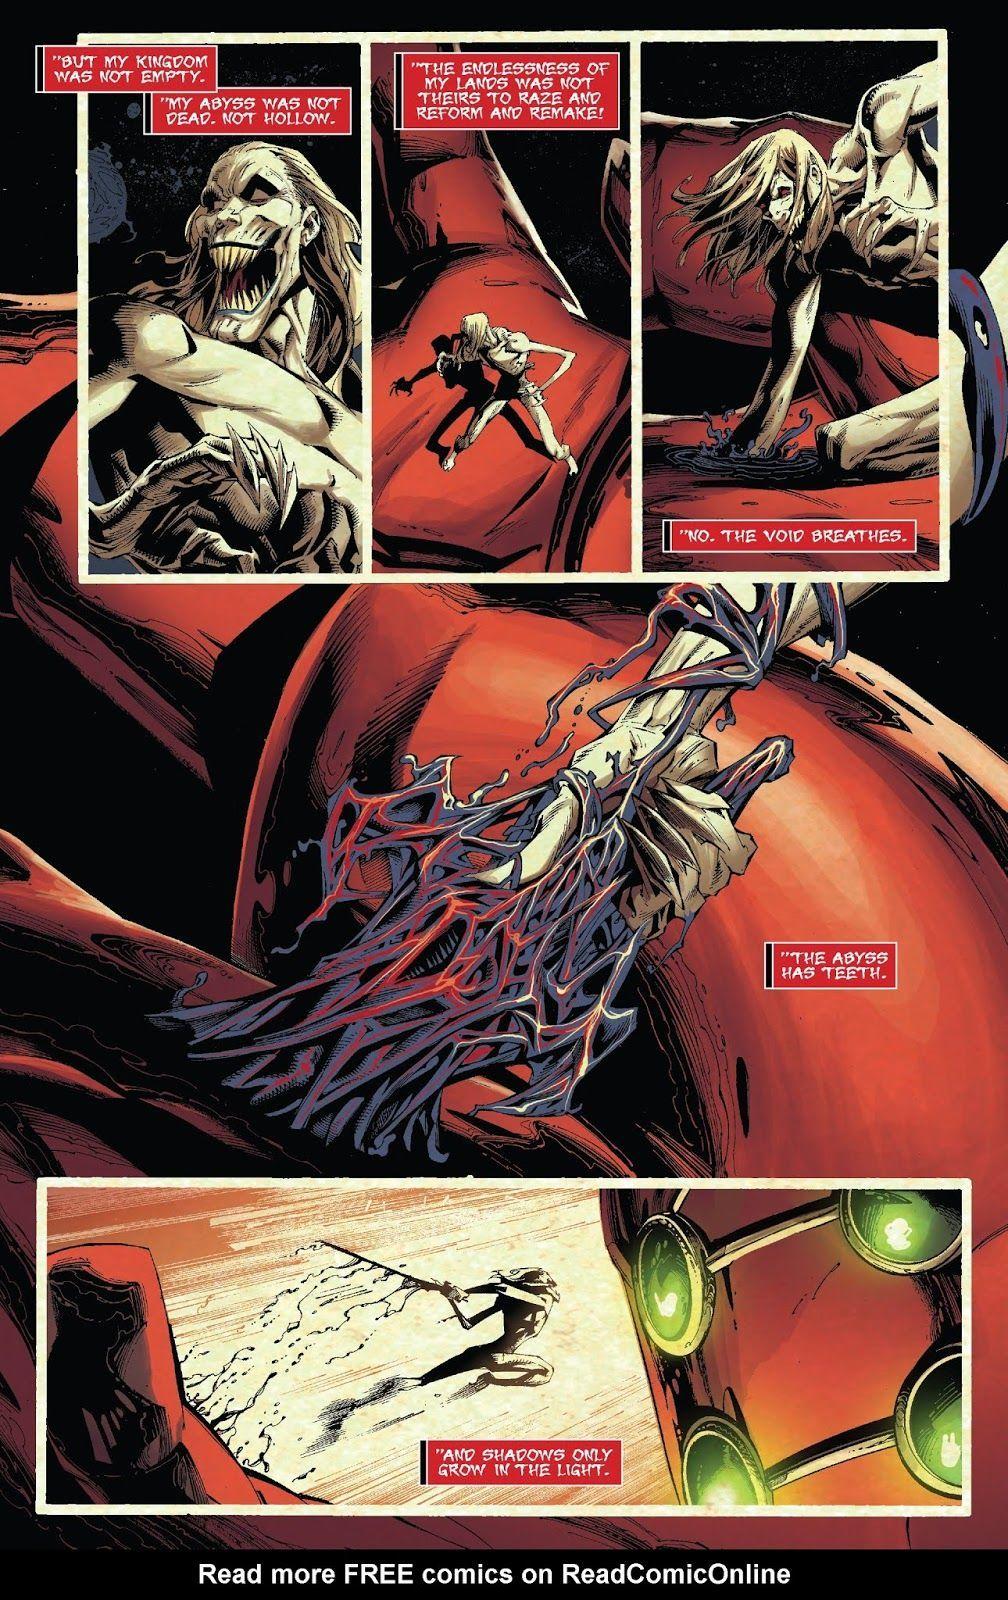 Marvel creators reveal Carnage's sociopathic origin, plus